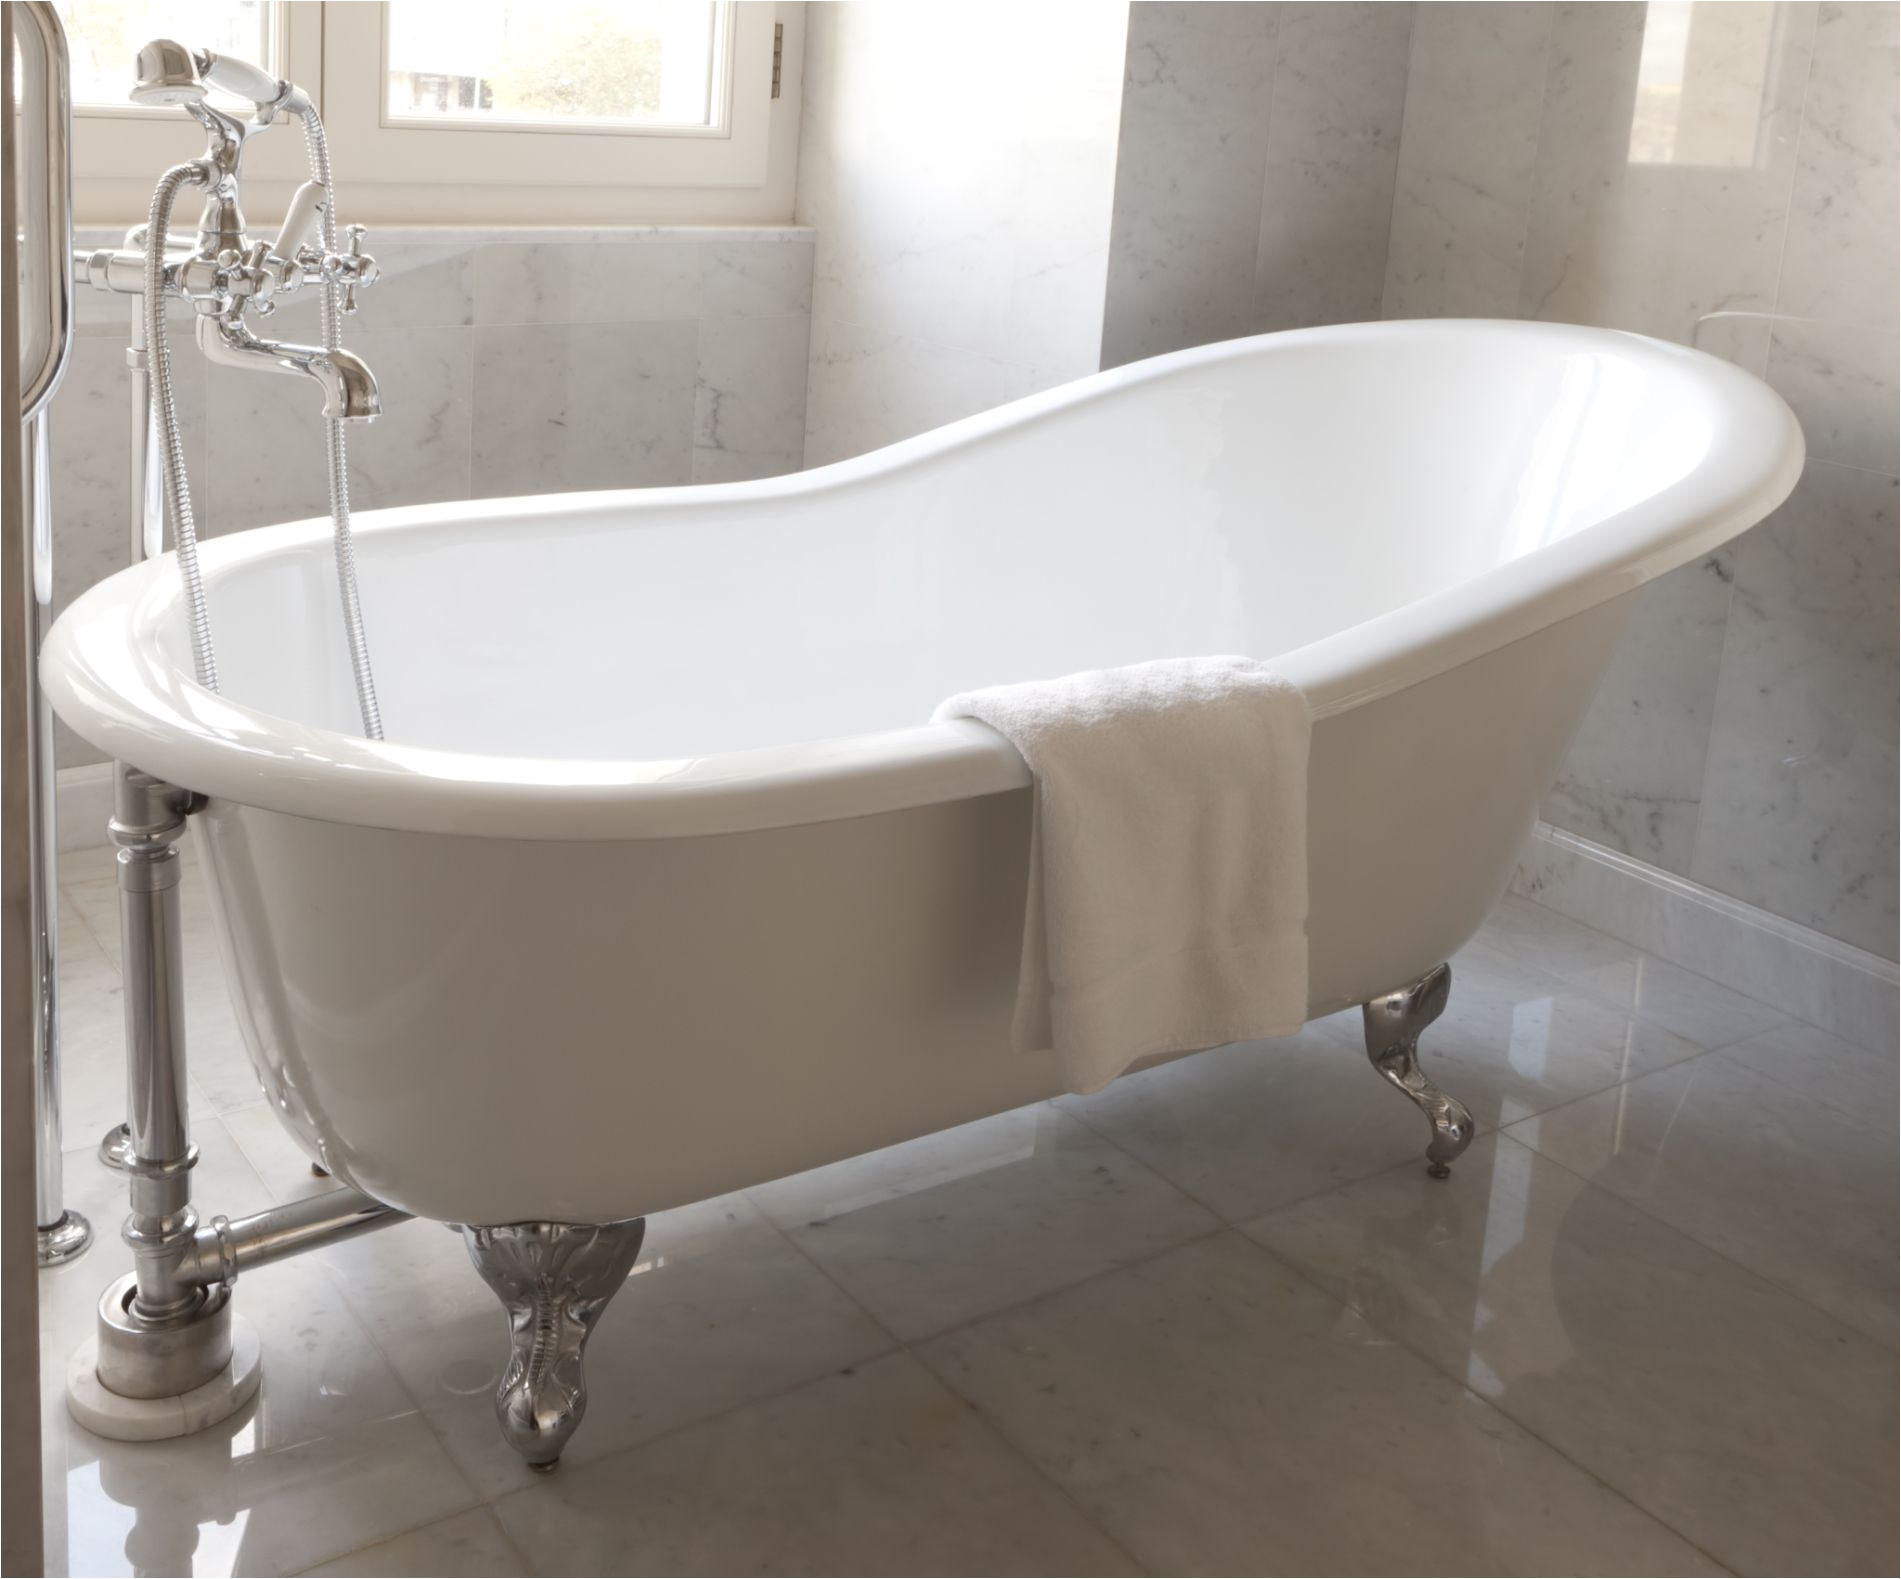 pin by seo on san diego bath tub refinishing pinterest bath tubs restoration and tubs